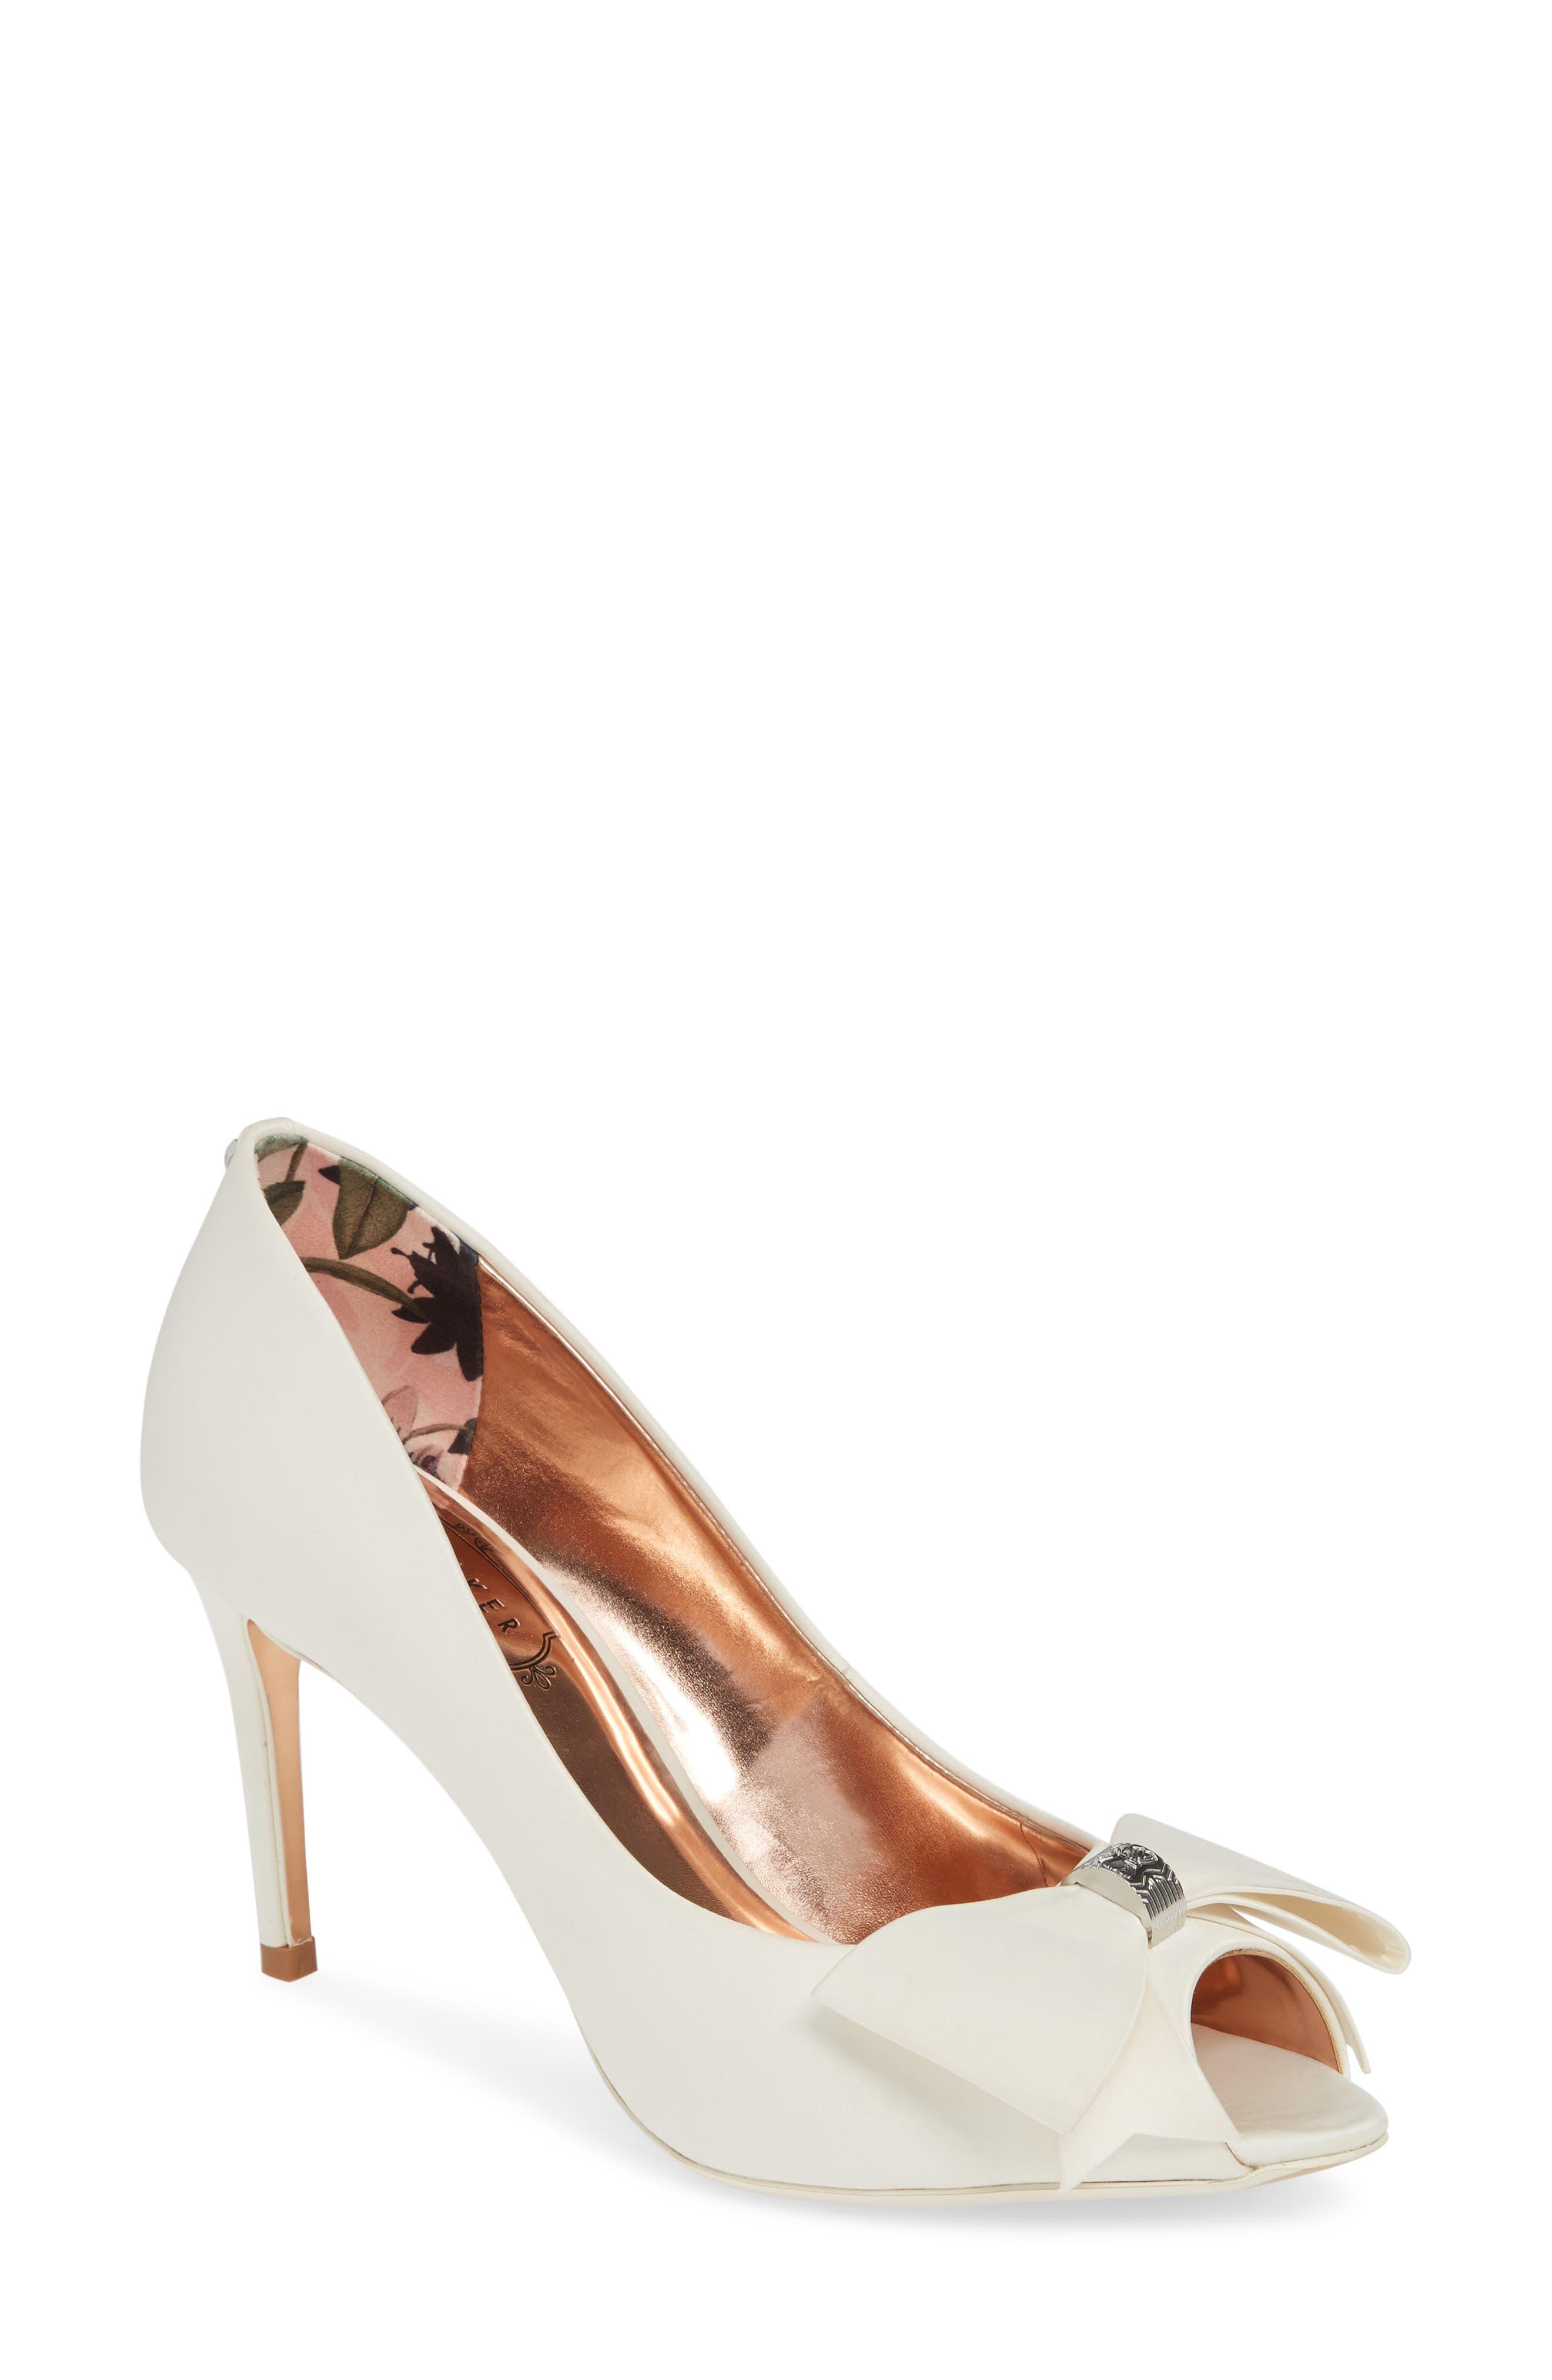 Shoes, secured! : weddingplanning